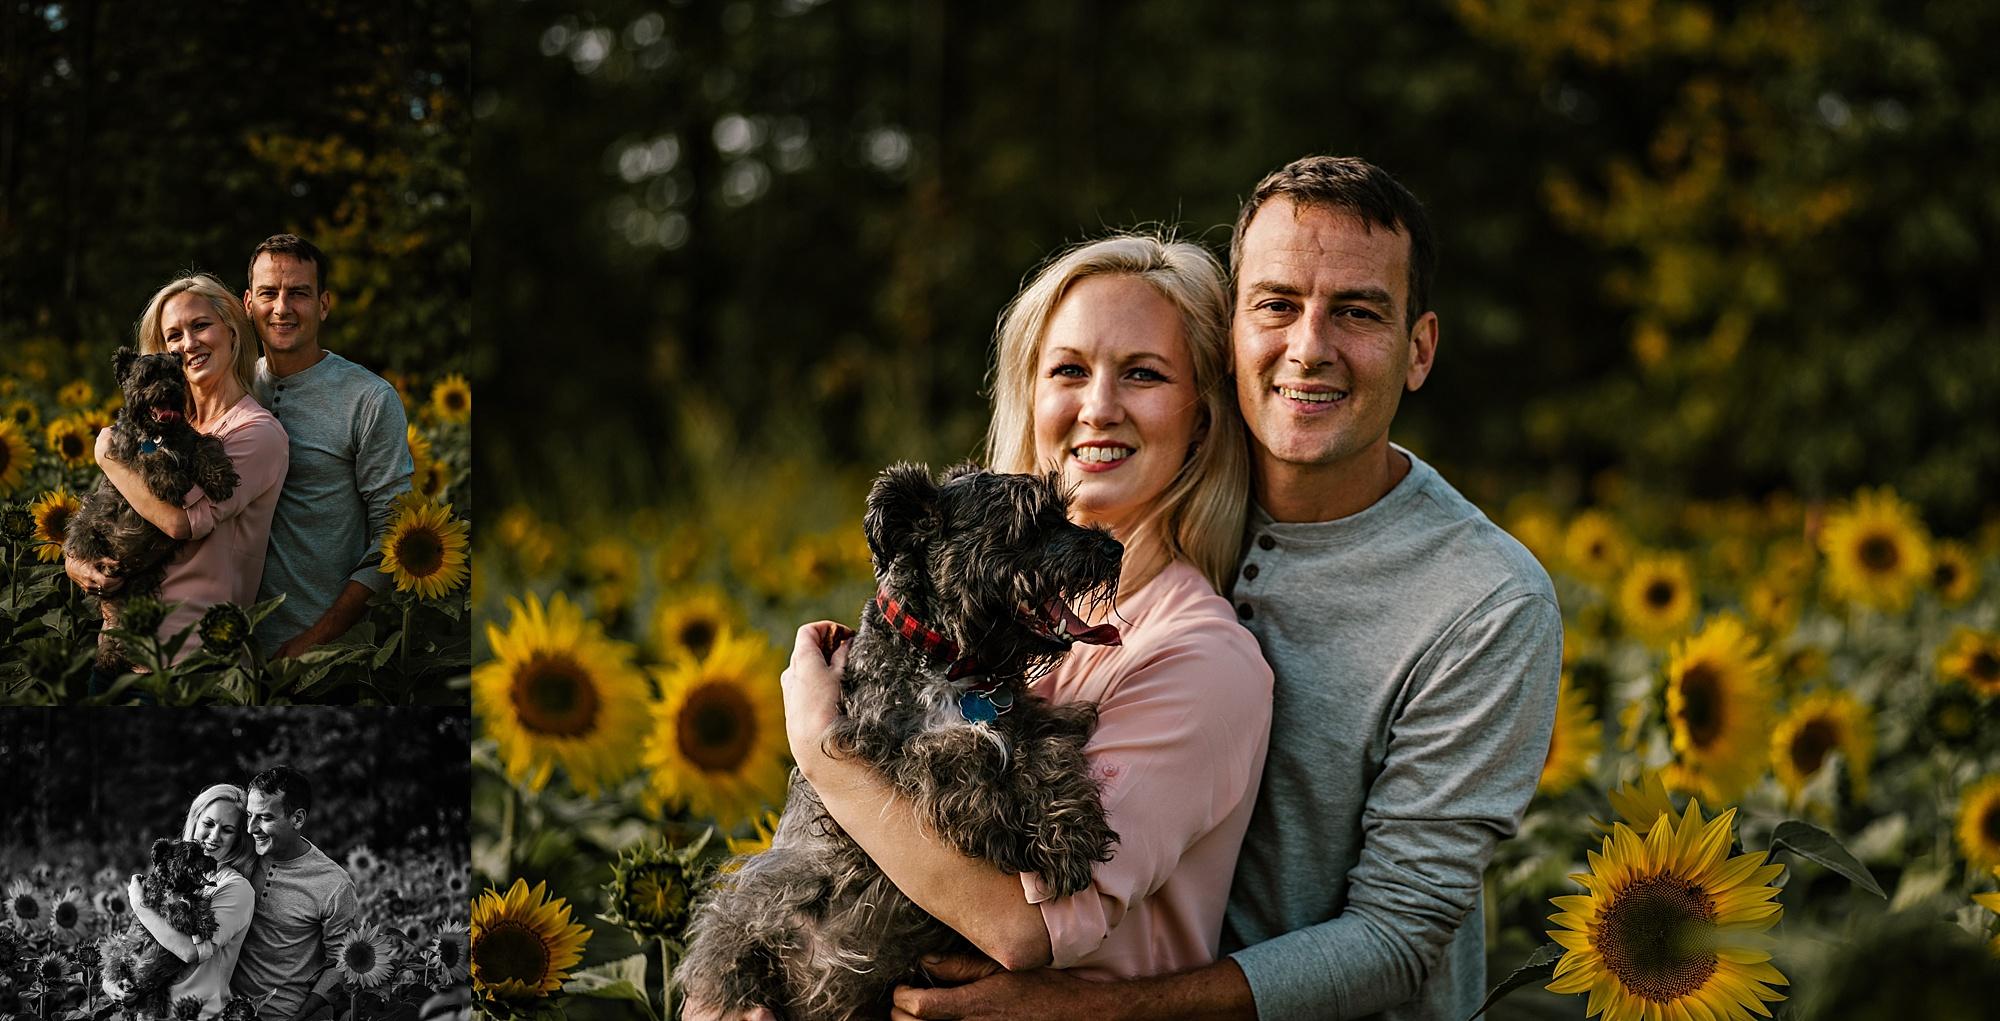 Lori-and-mike-akron-ohio-photographer-lauren-grayson-sunflower-field-session_0002.jpg